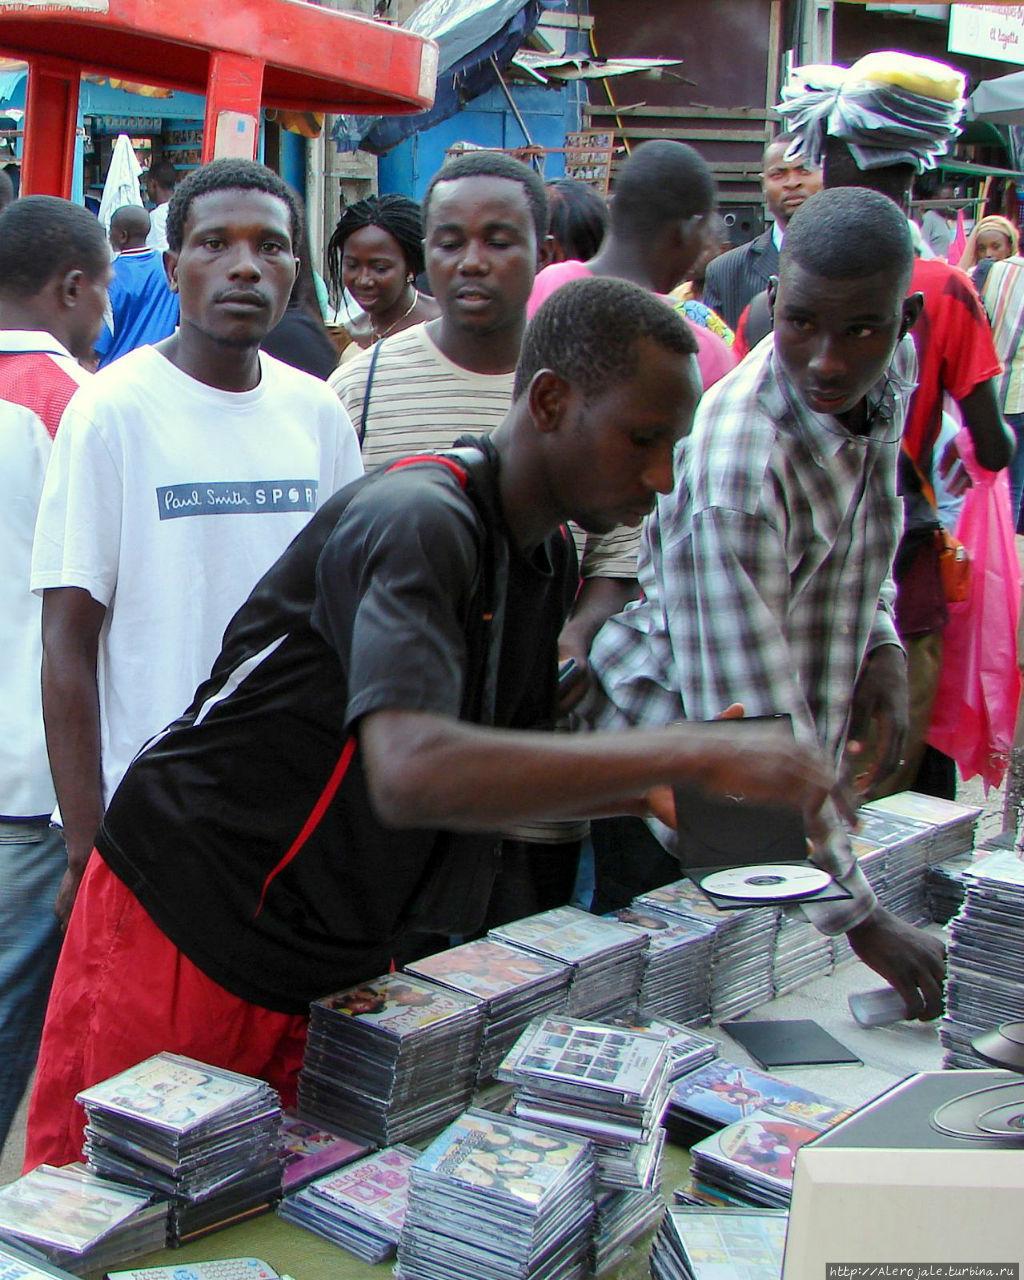 Габон — прогресс или наоборот Либревиль, Габон